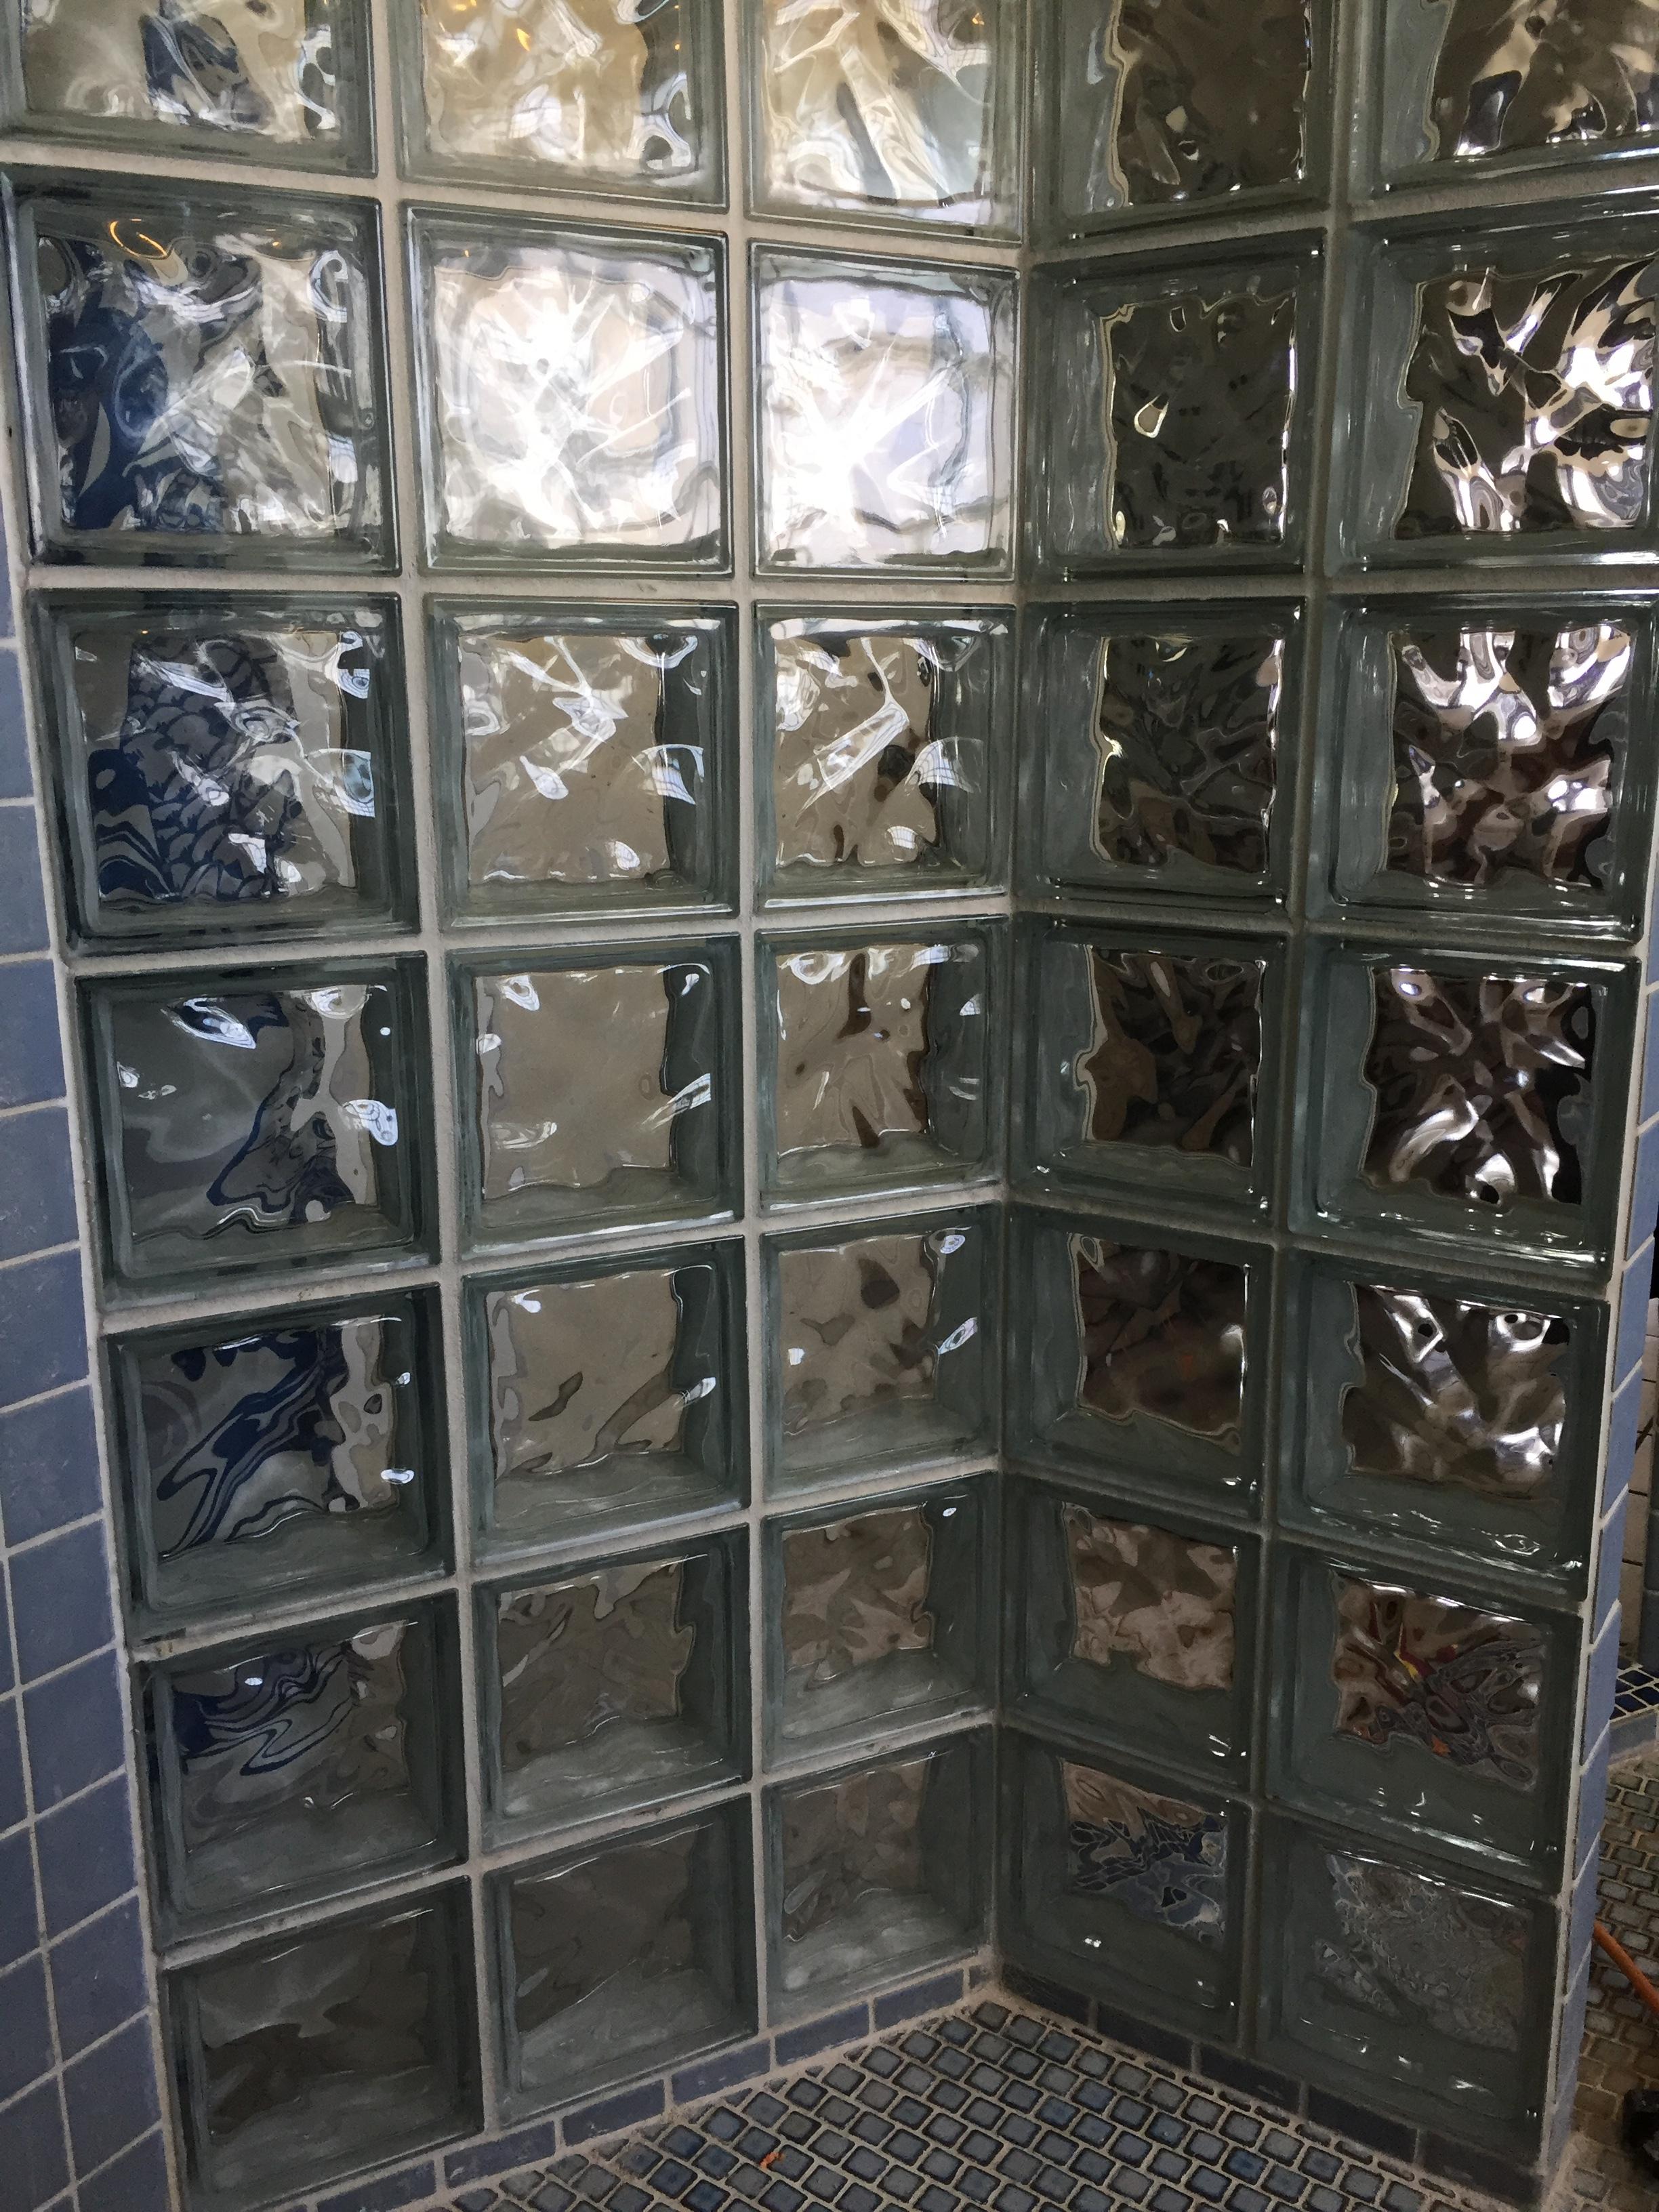 Shower glass blocks after